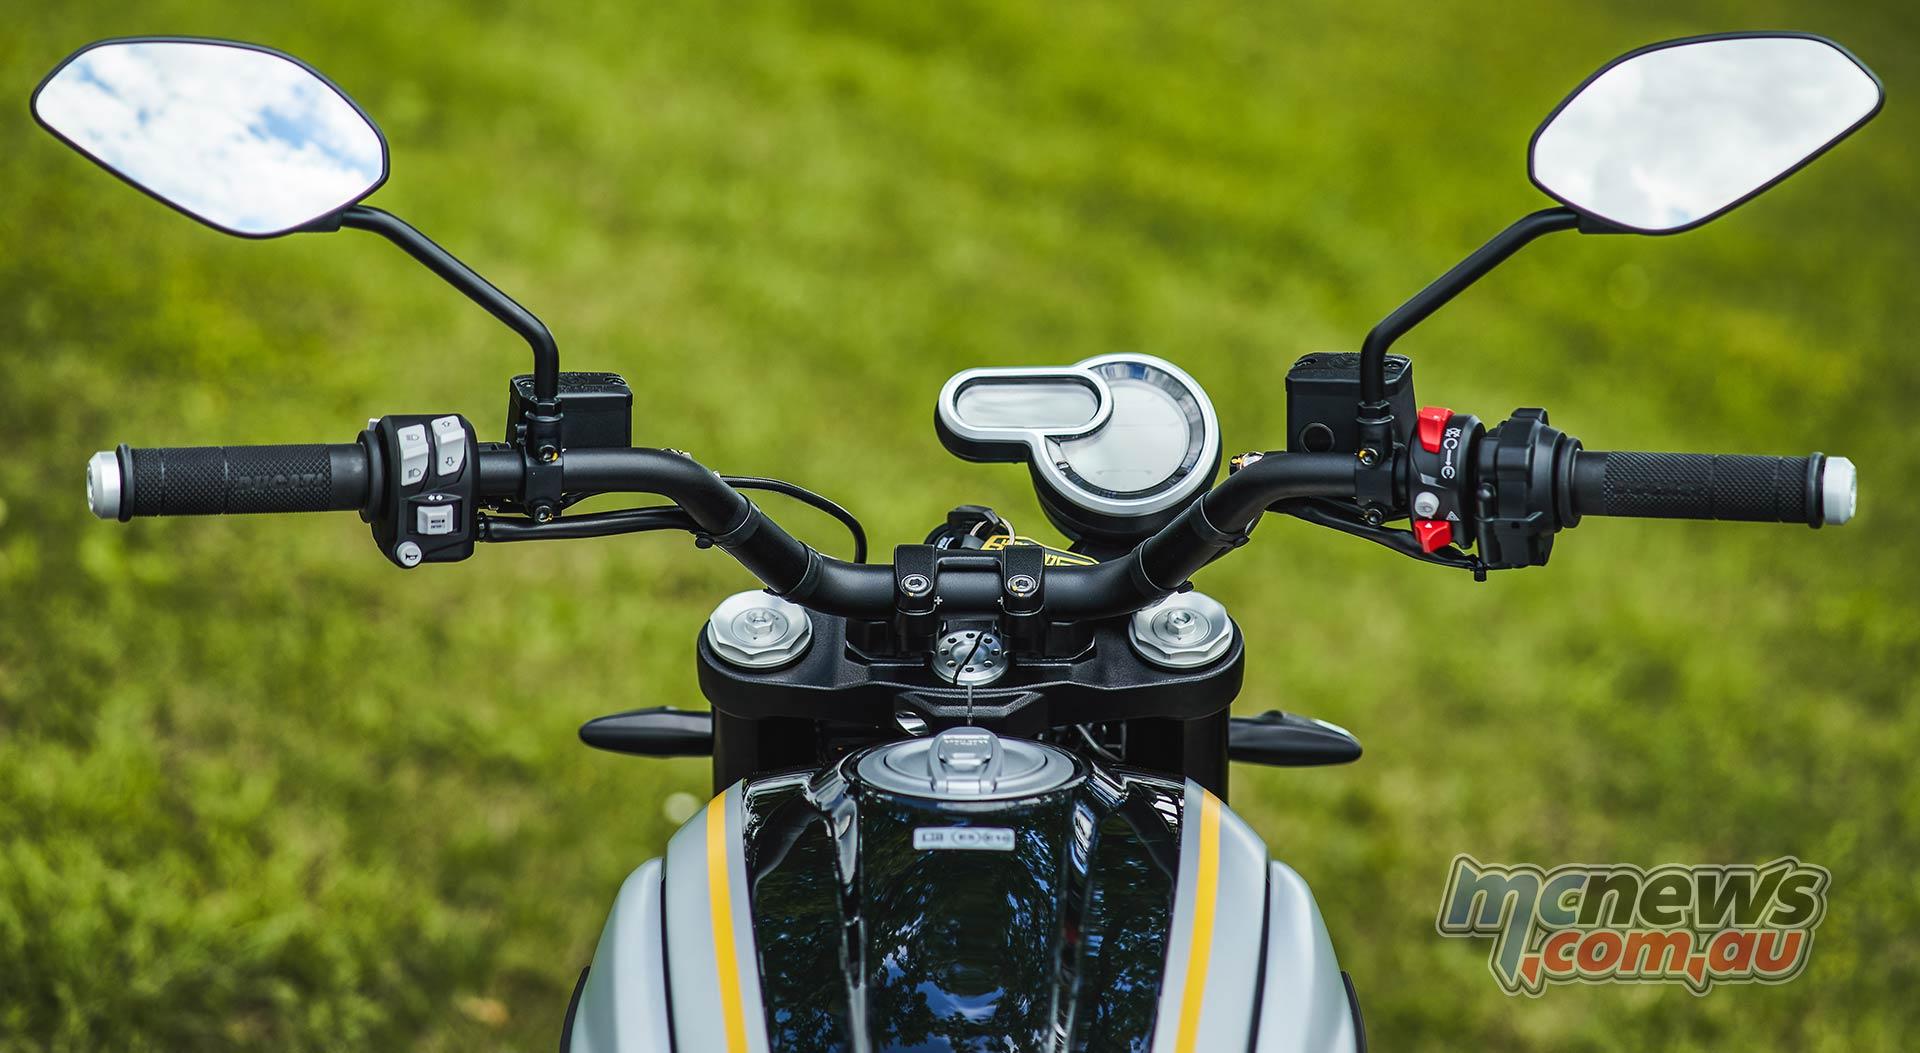 2021 Ducati Scrambler 1100 Pro - Dual element LCD panel